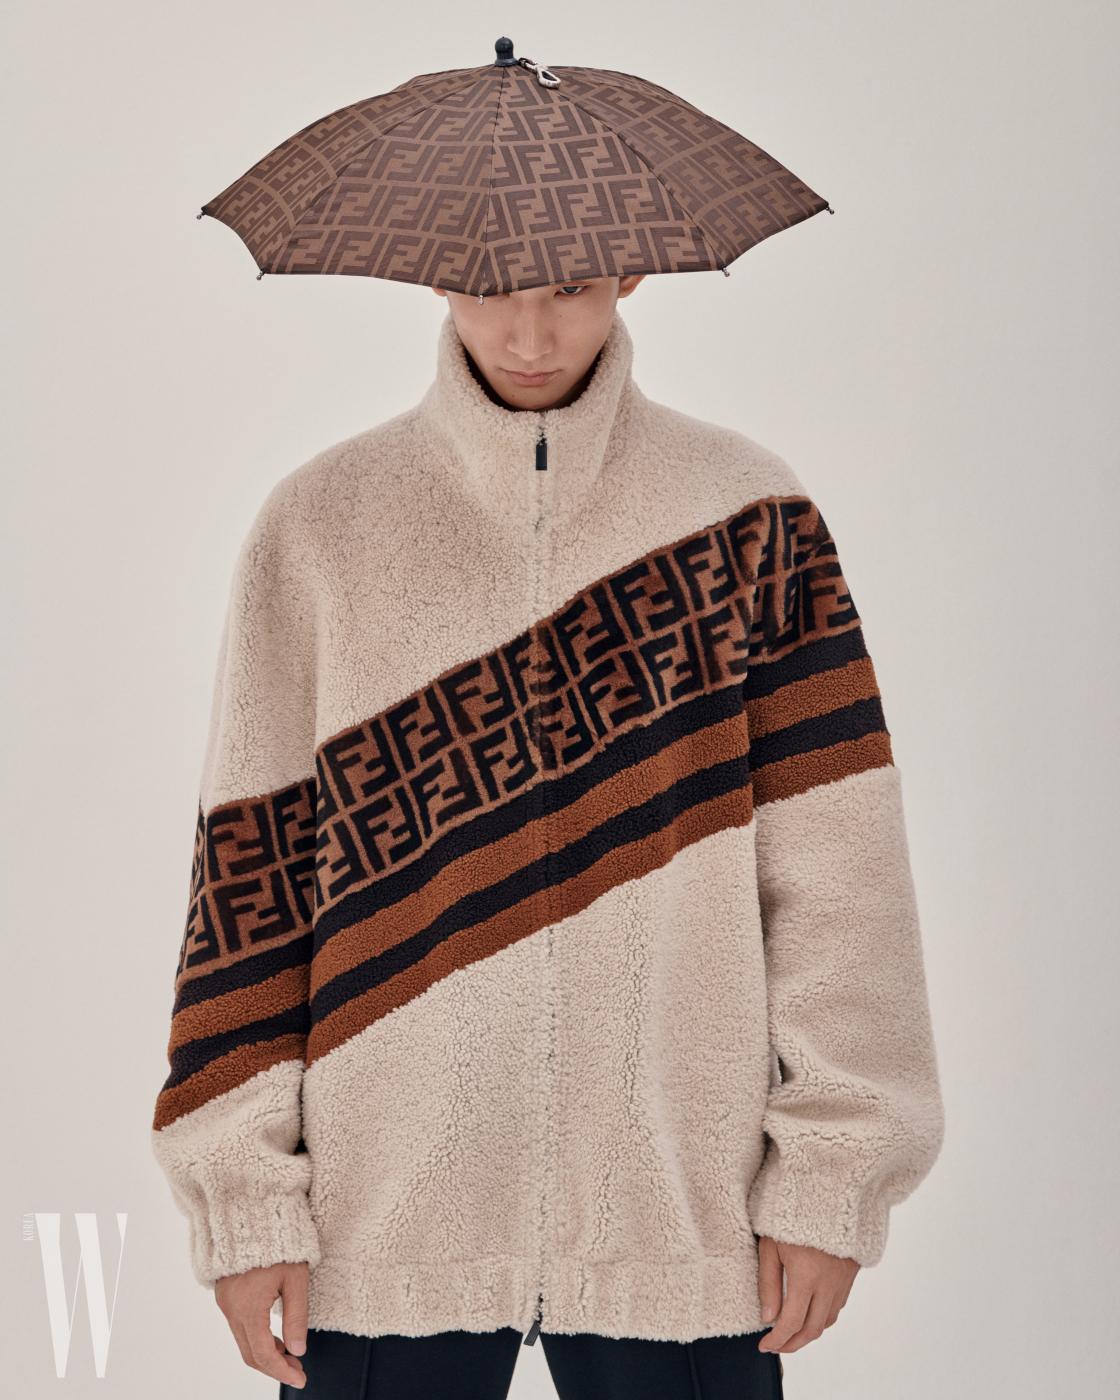 FF 로고의 우산 헤드피스와 시어링 집업 재킷, 팬츠는 펜디 제품.